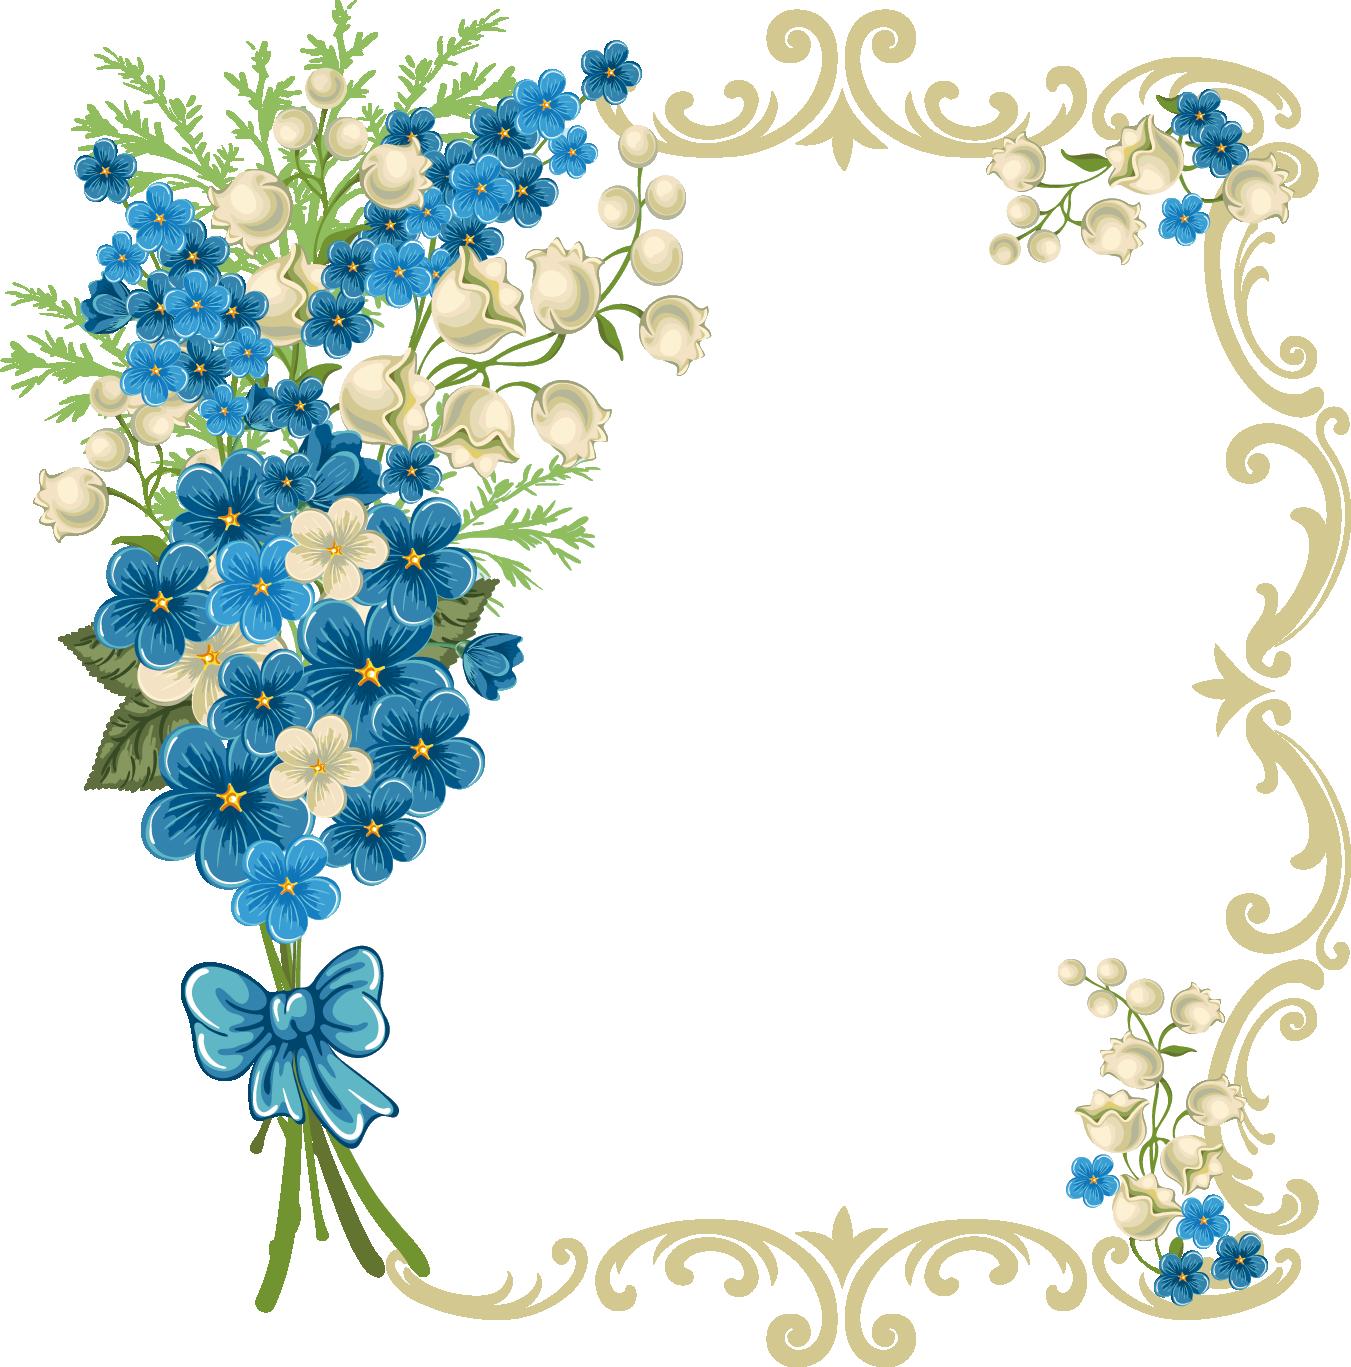 Blue vintage flower clipart jpg transparent download flower - Google'da Ara | YAZI FONLARI 2 | Pinterest | Flower ... jpg transparent download